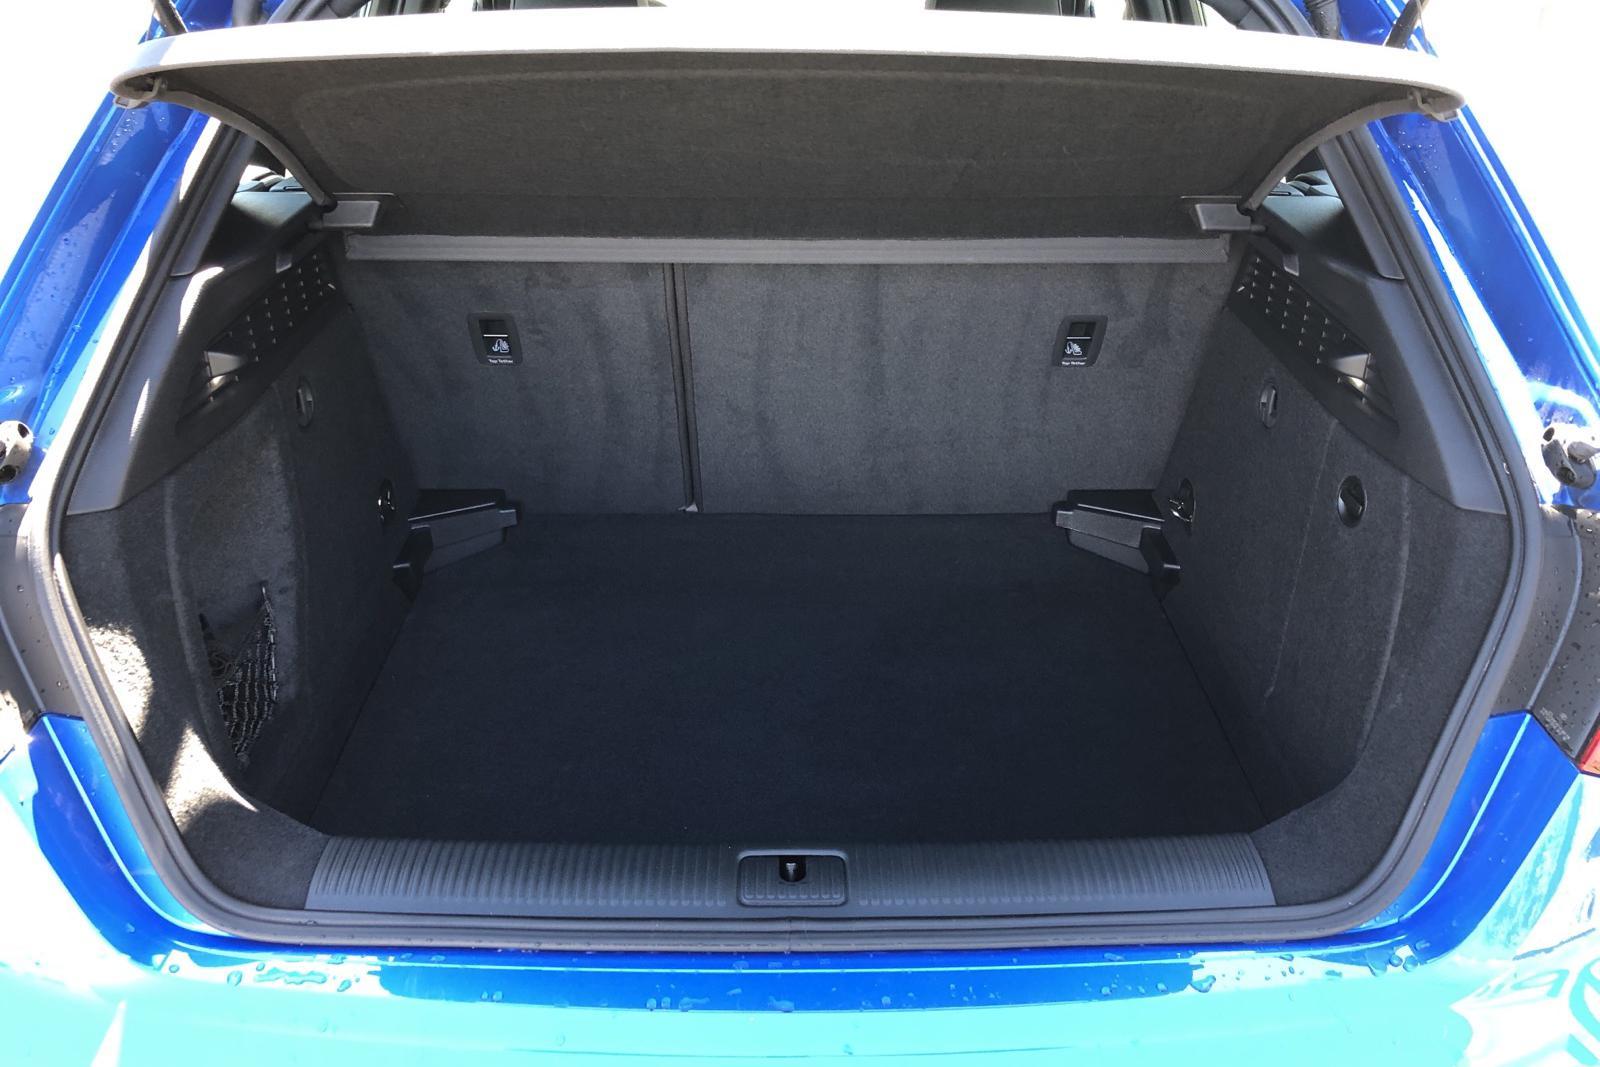 Audi A3 Sportback 35 TFSI (150hk) - 9 920 km - Manual - blue - 2019